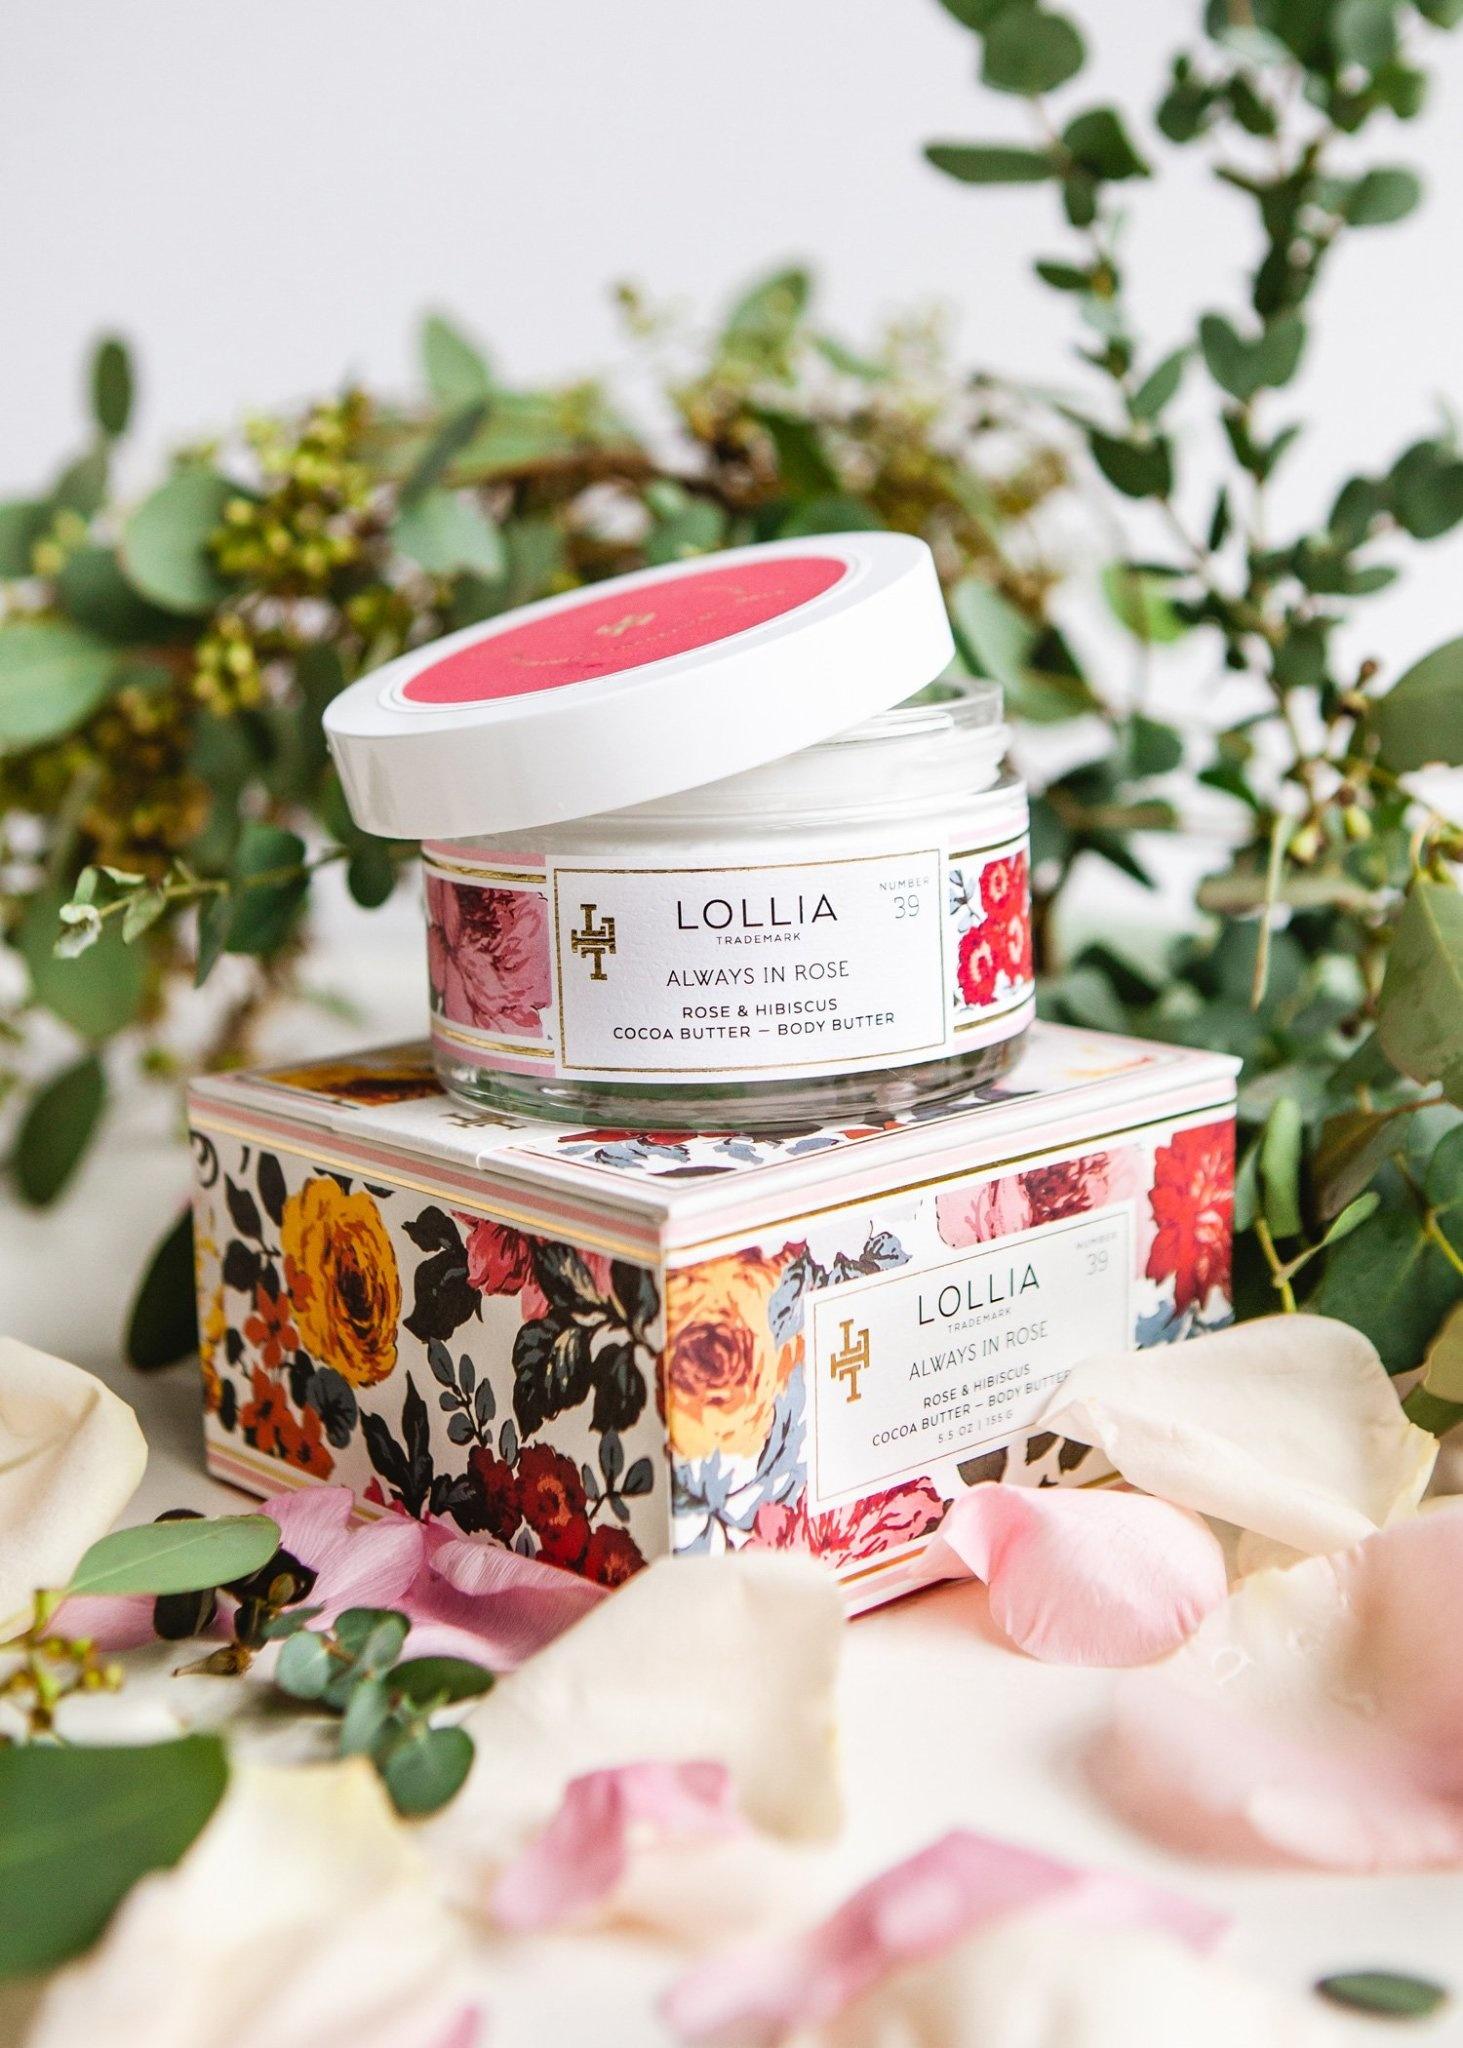 Lollia Always In Rose Body Butter